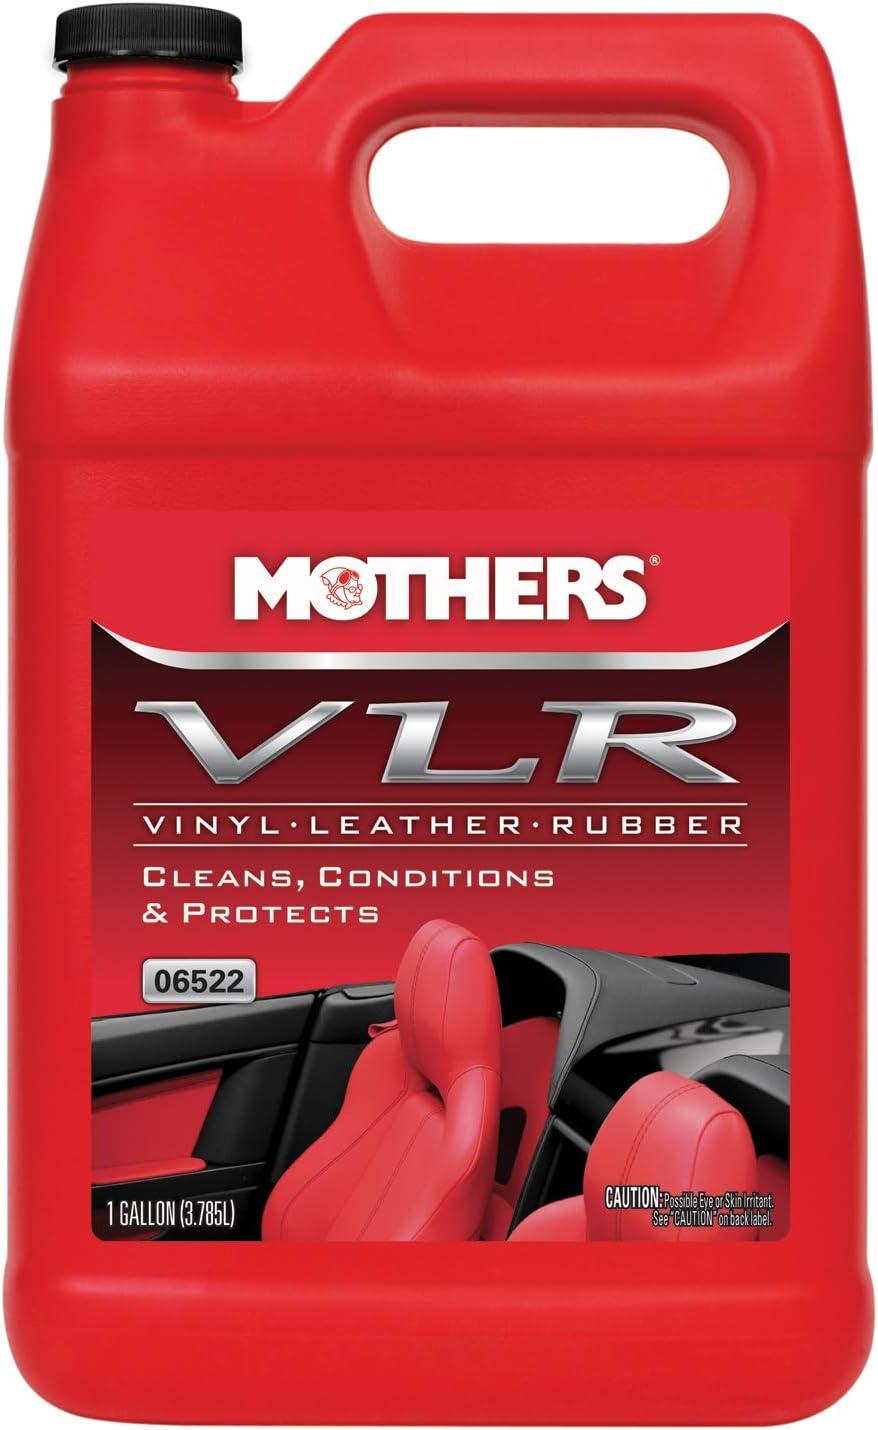 Mothers 06522 VLR VinylLeatherRubber Care - 1 Gallon